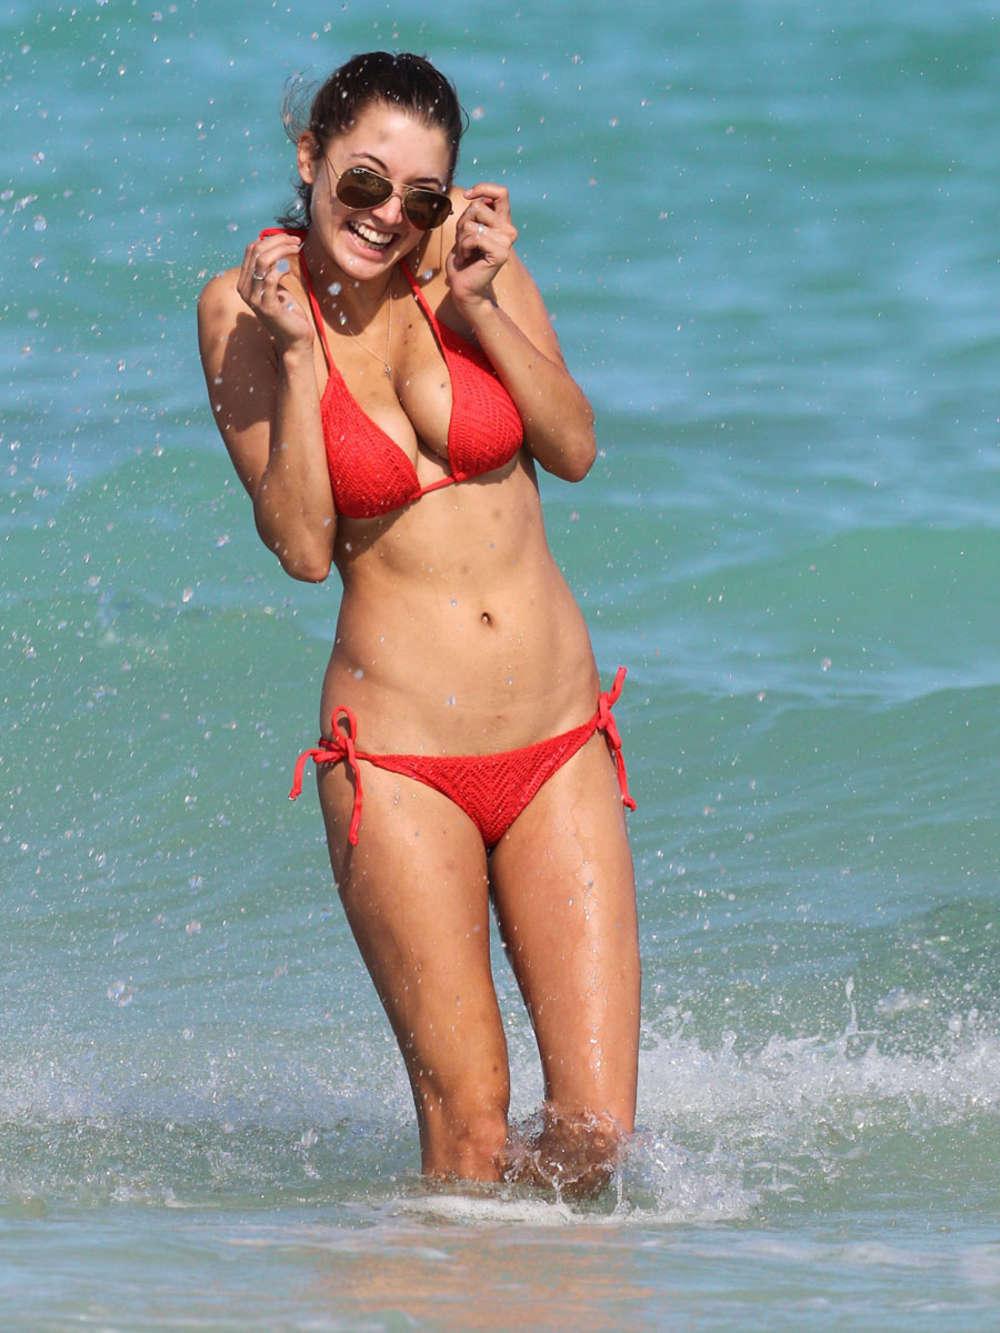 Alyssa Arce 2013 : Alyssa Arce Hot Bikini Photos: Miami -11